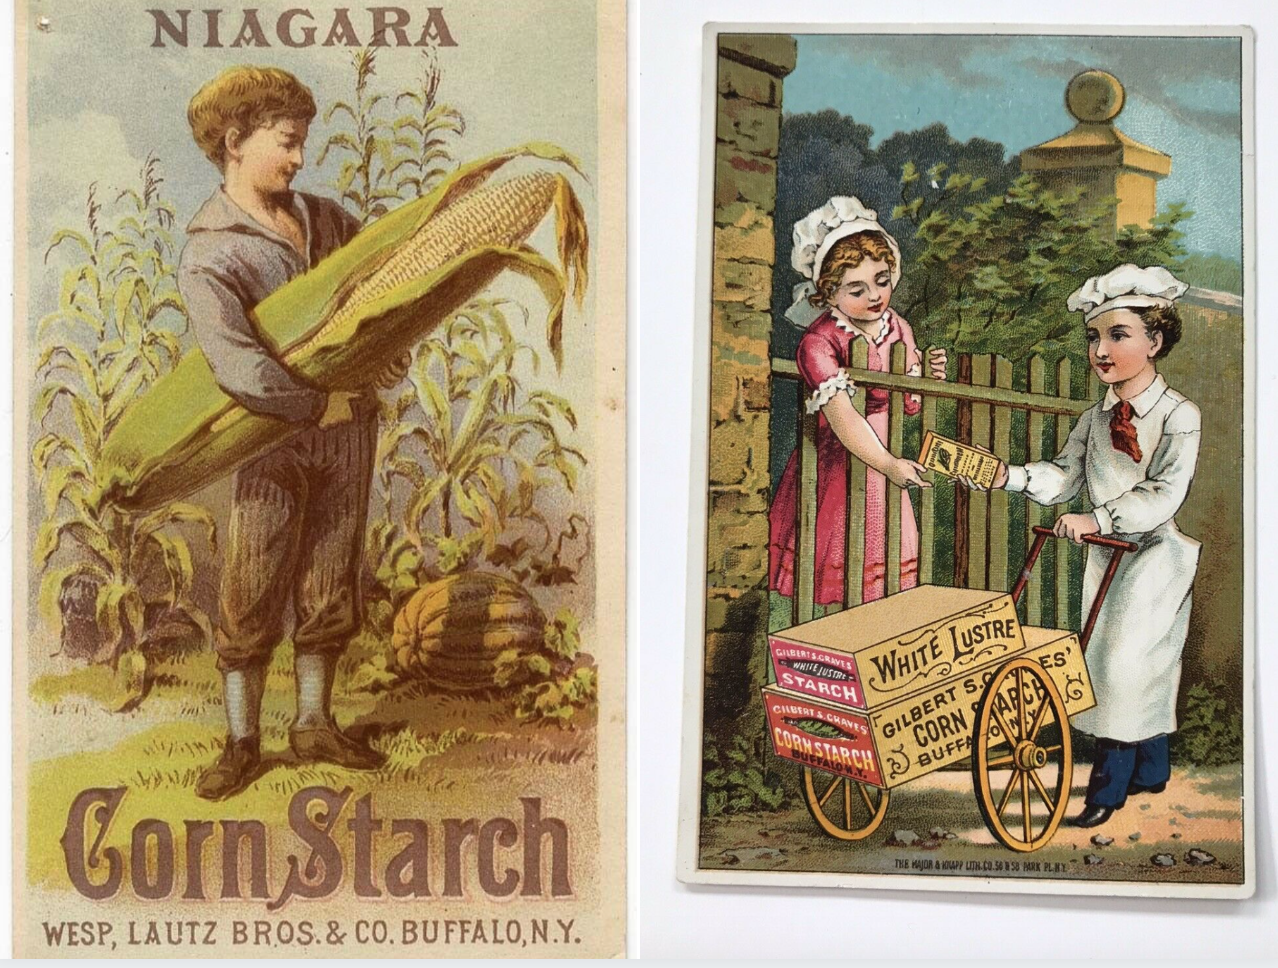 Cornstarch trading cards